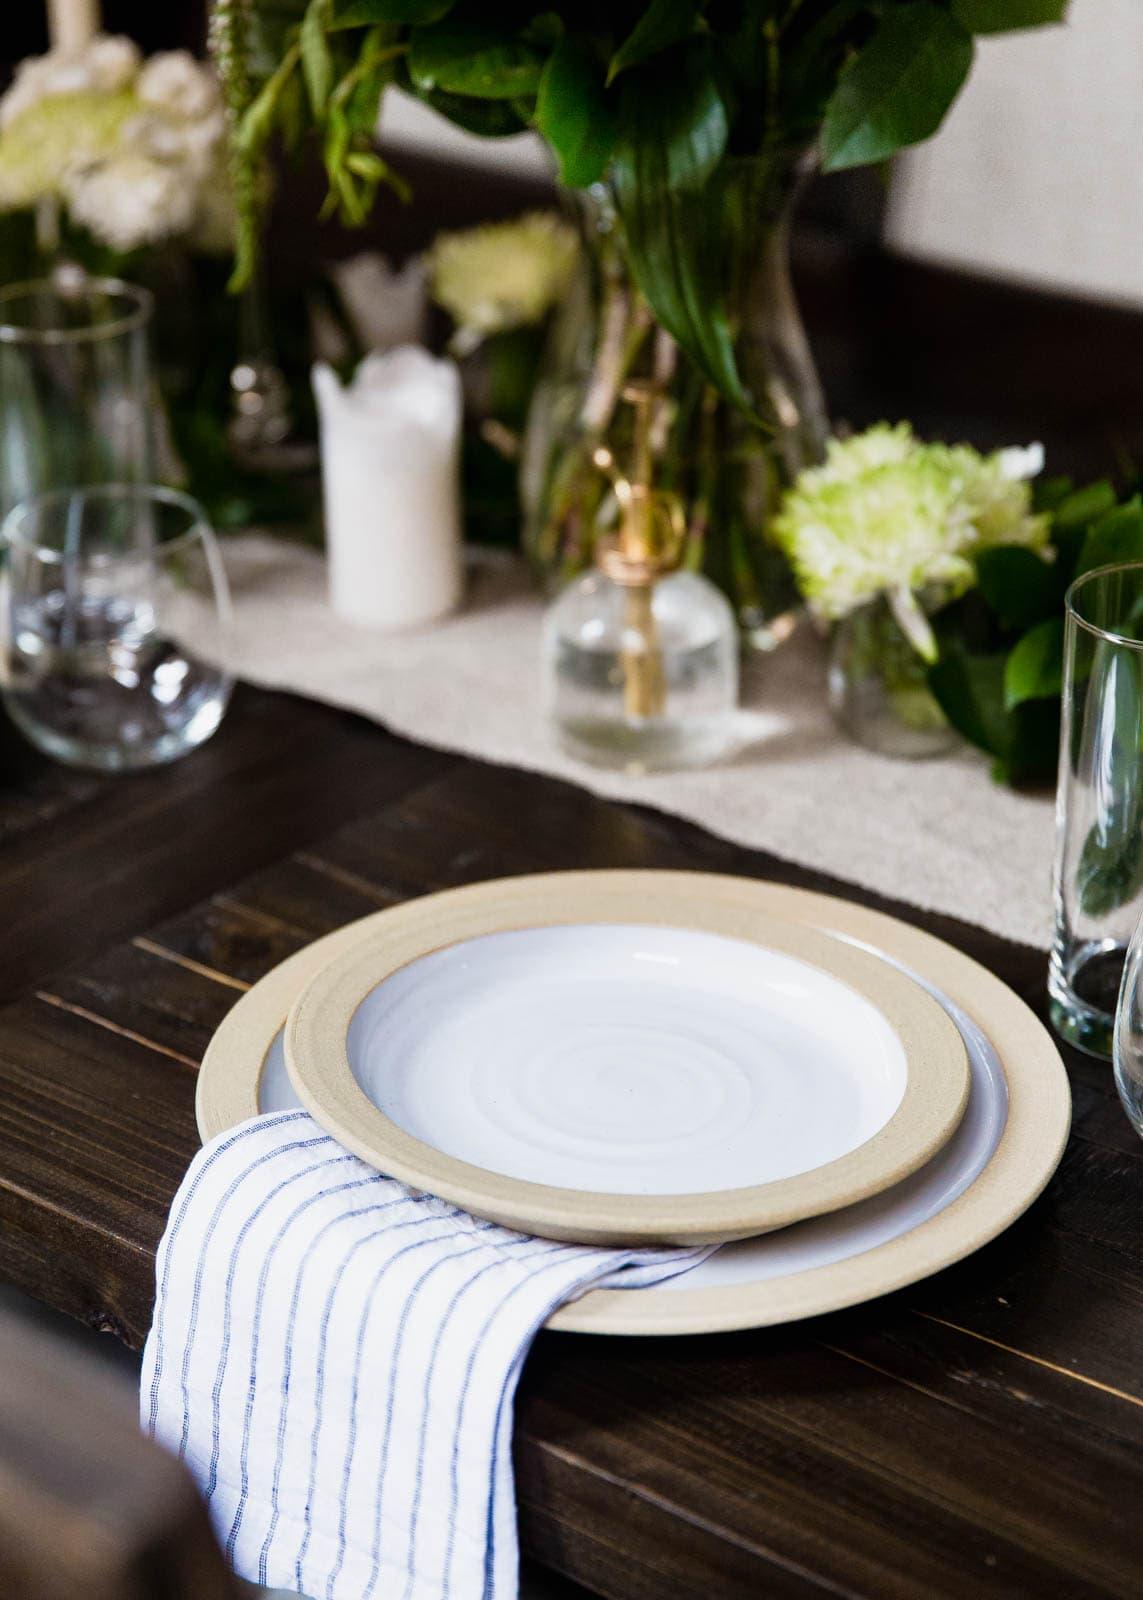 Farmhouse Pottery Plates <3